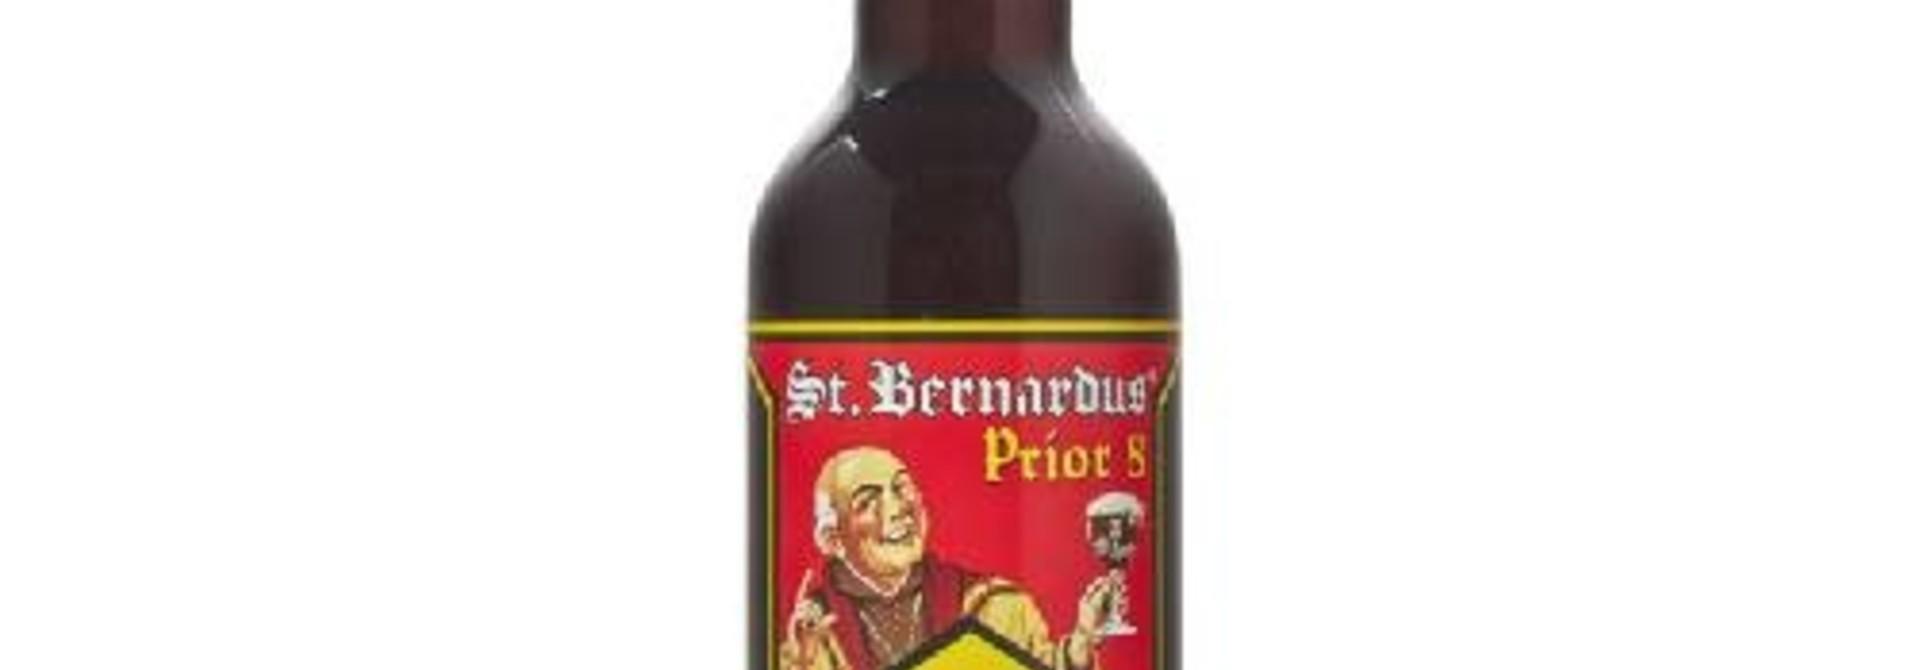 ST. BERNARDUS PRIOR 75CL